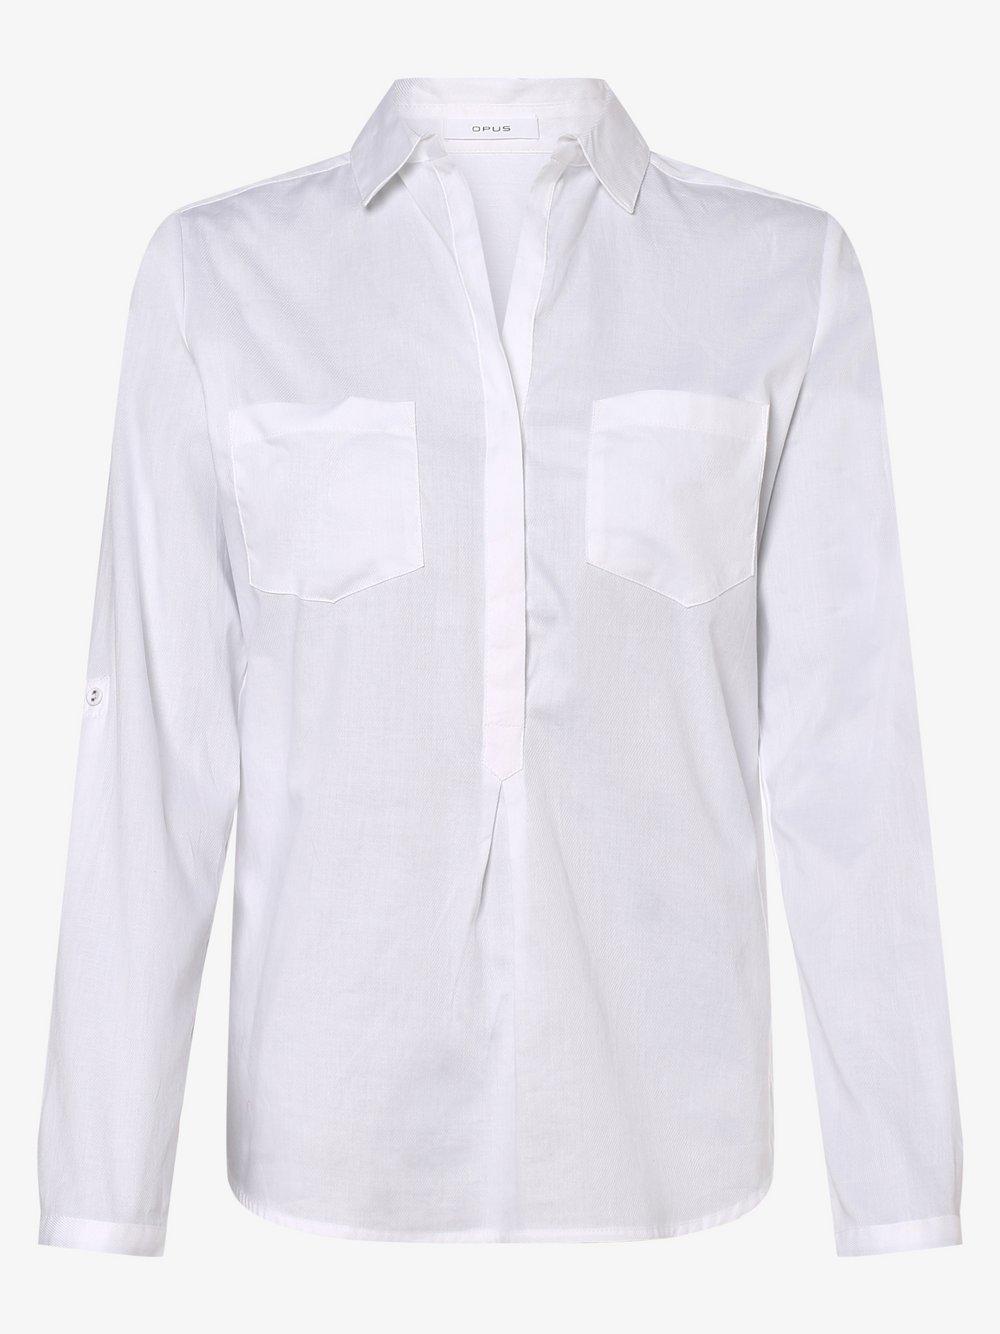 Opus - Bluzka damska – Falenta, biały